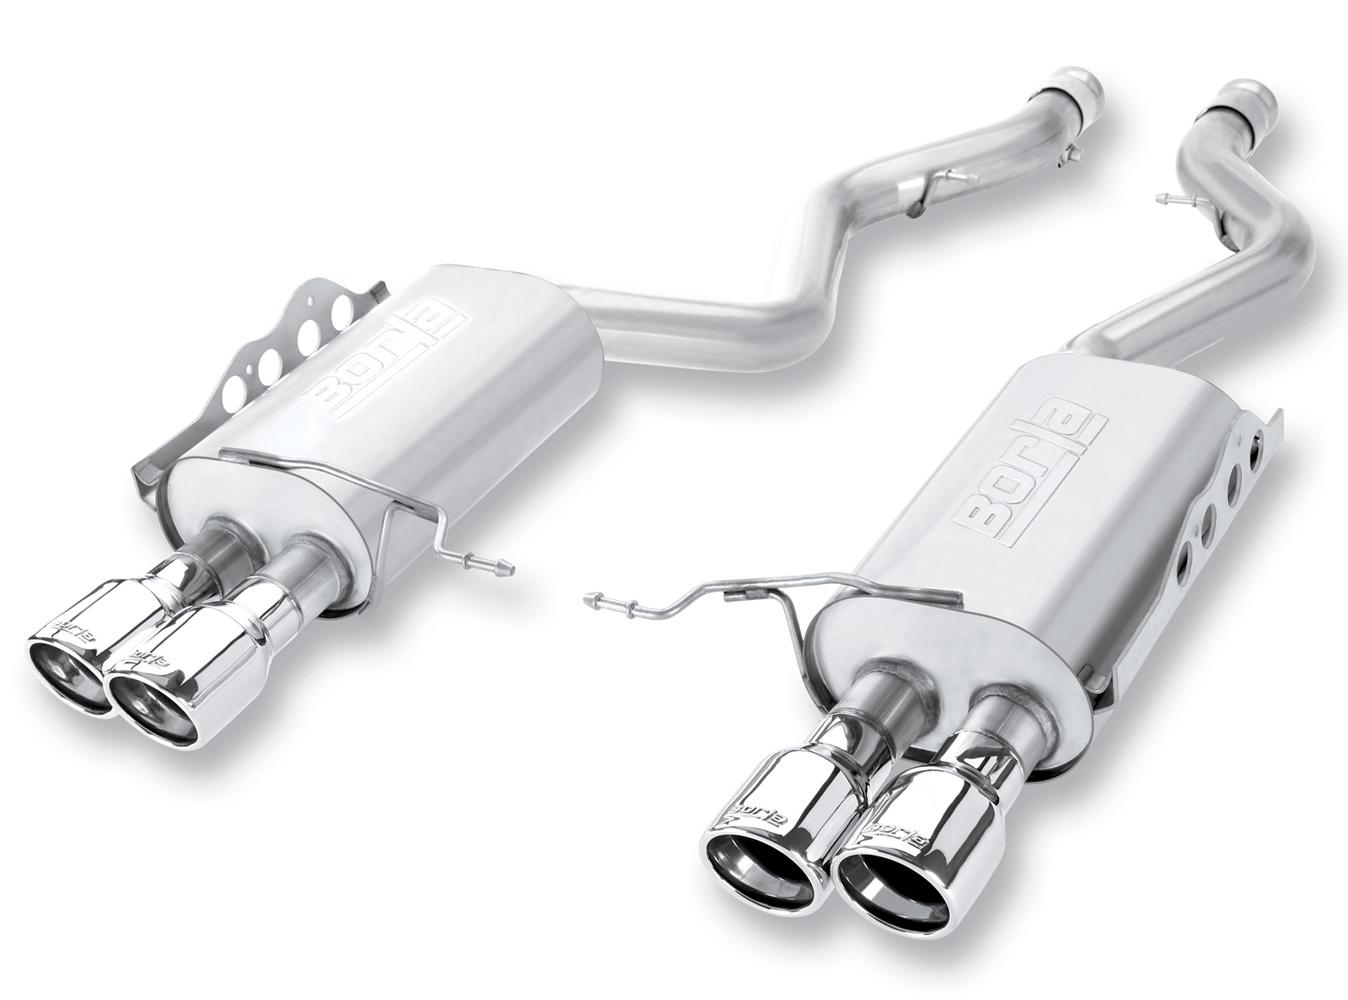 borla exhaust system 140472